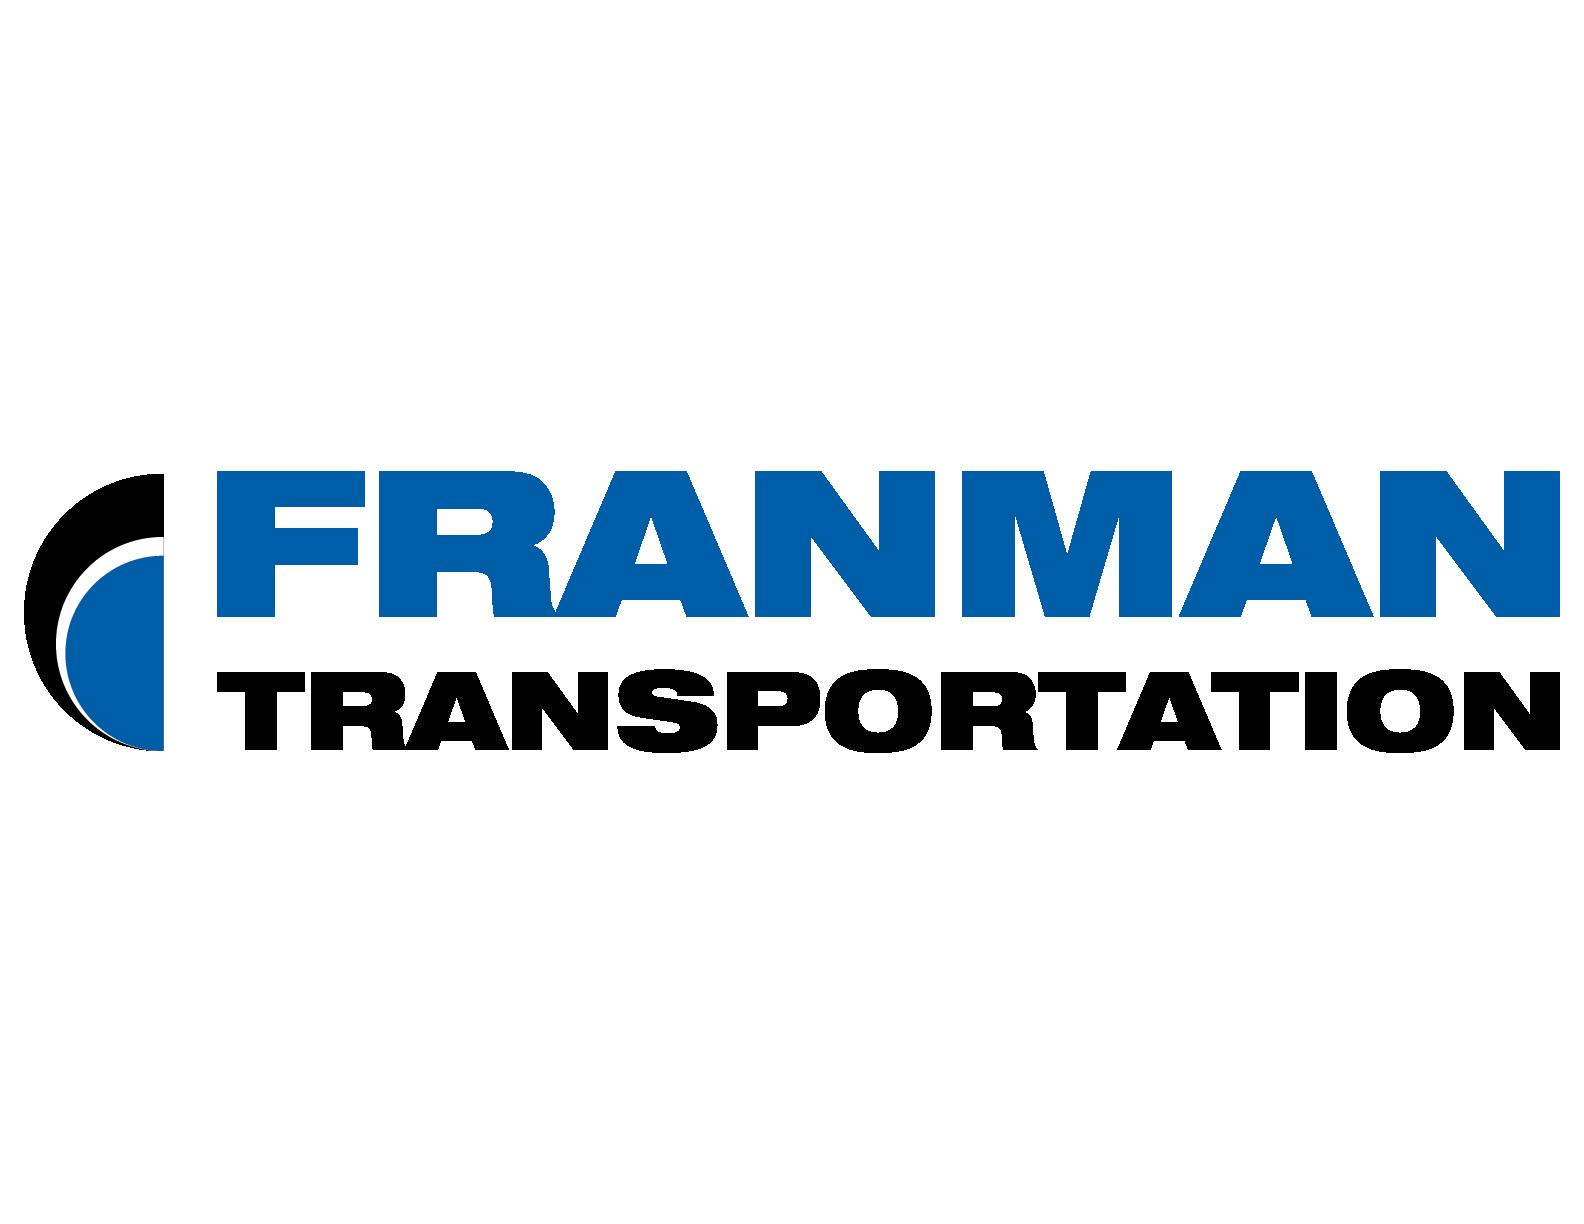 Franman Transportation